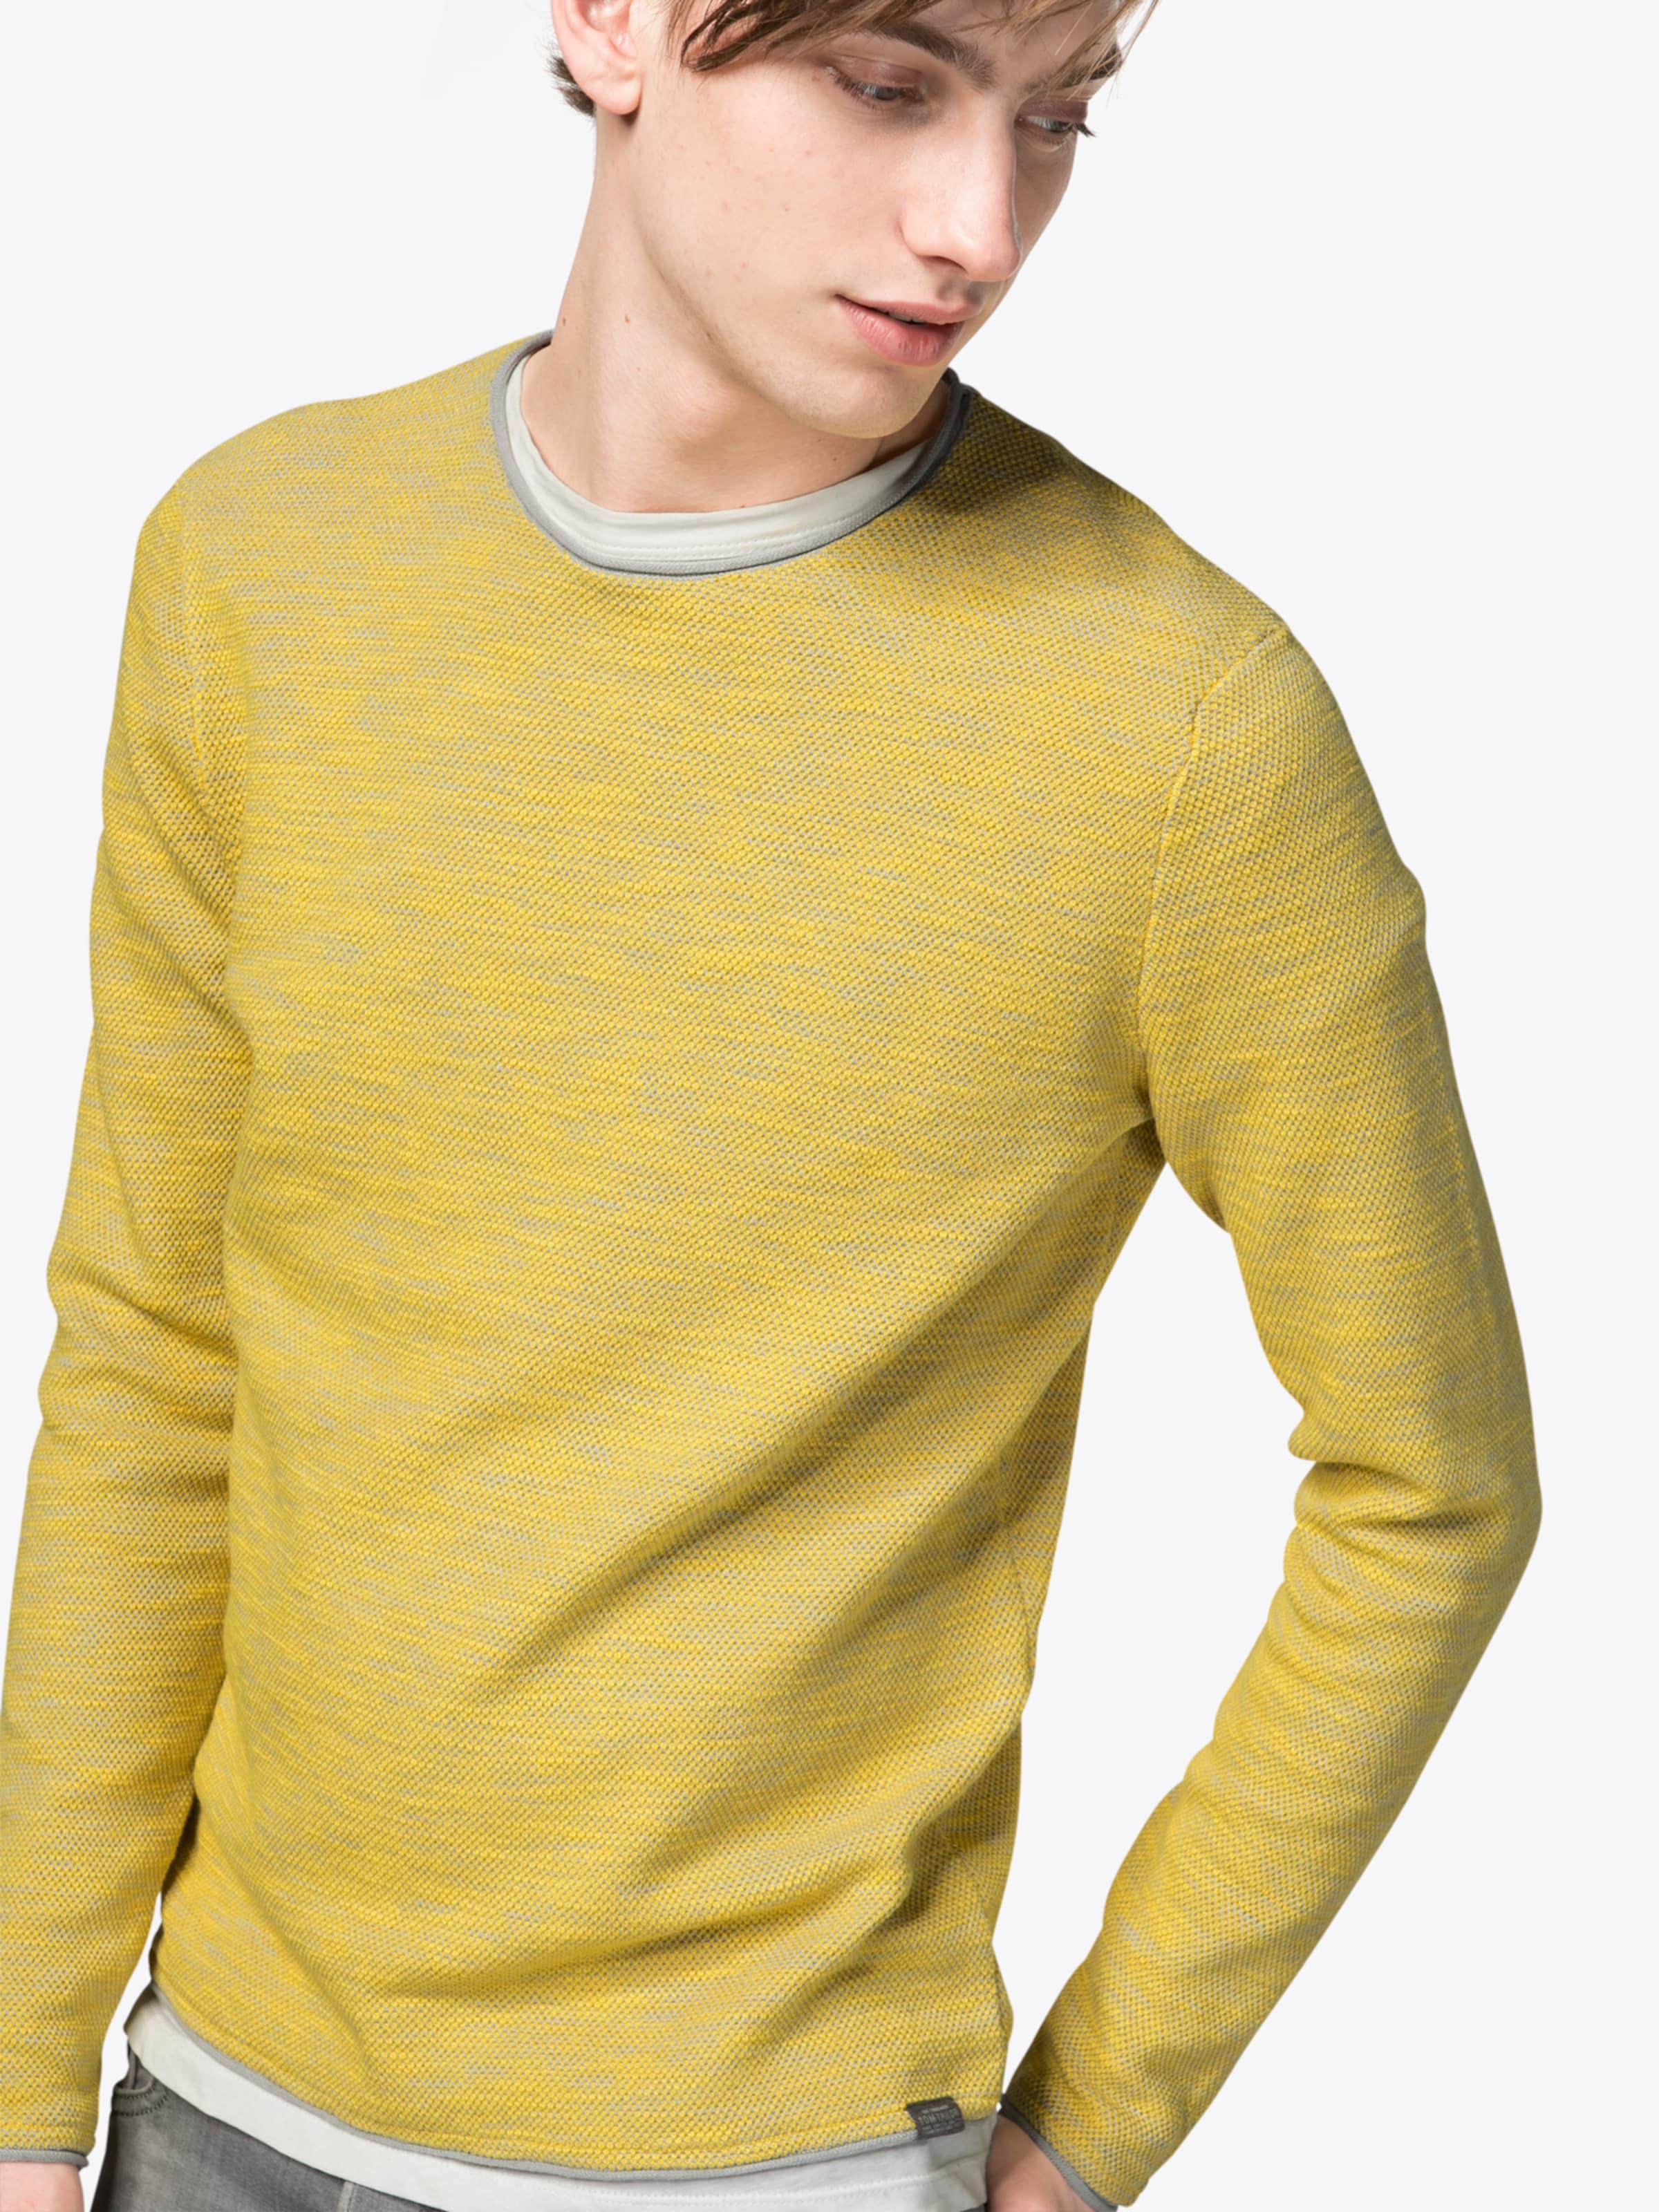 TOM TAILOR Pullover 'structured crew neck sweater' Outlet Günstig Online Manchester Günstig Online b4wk3h